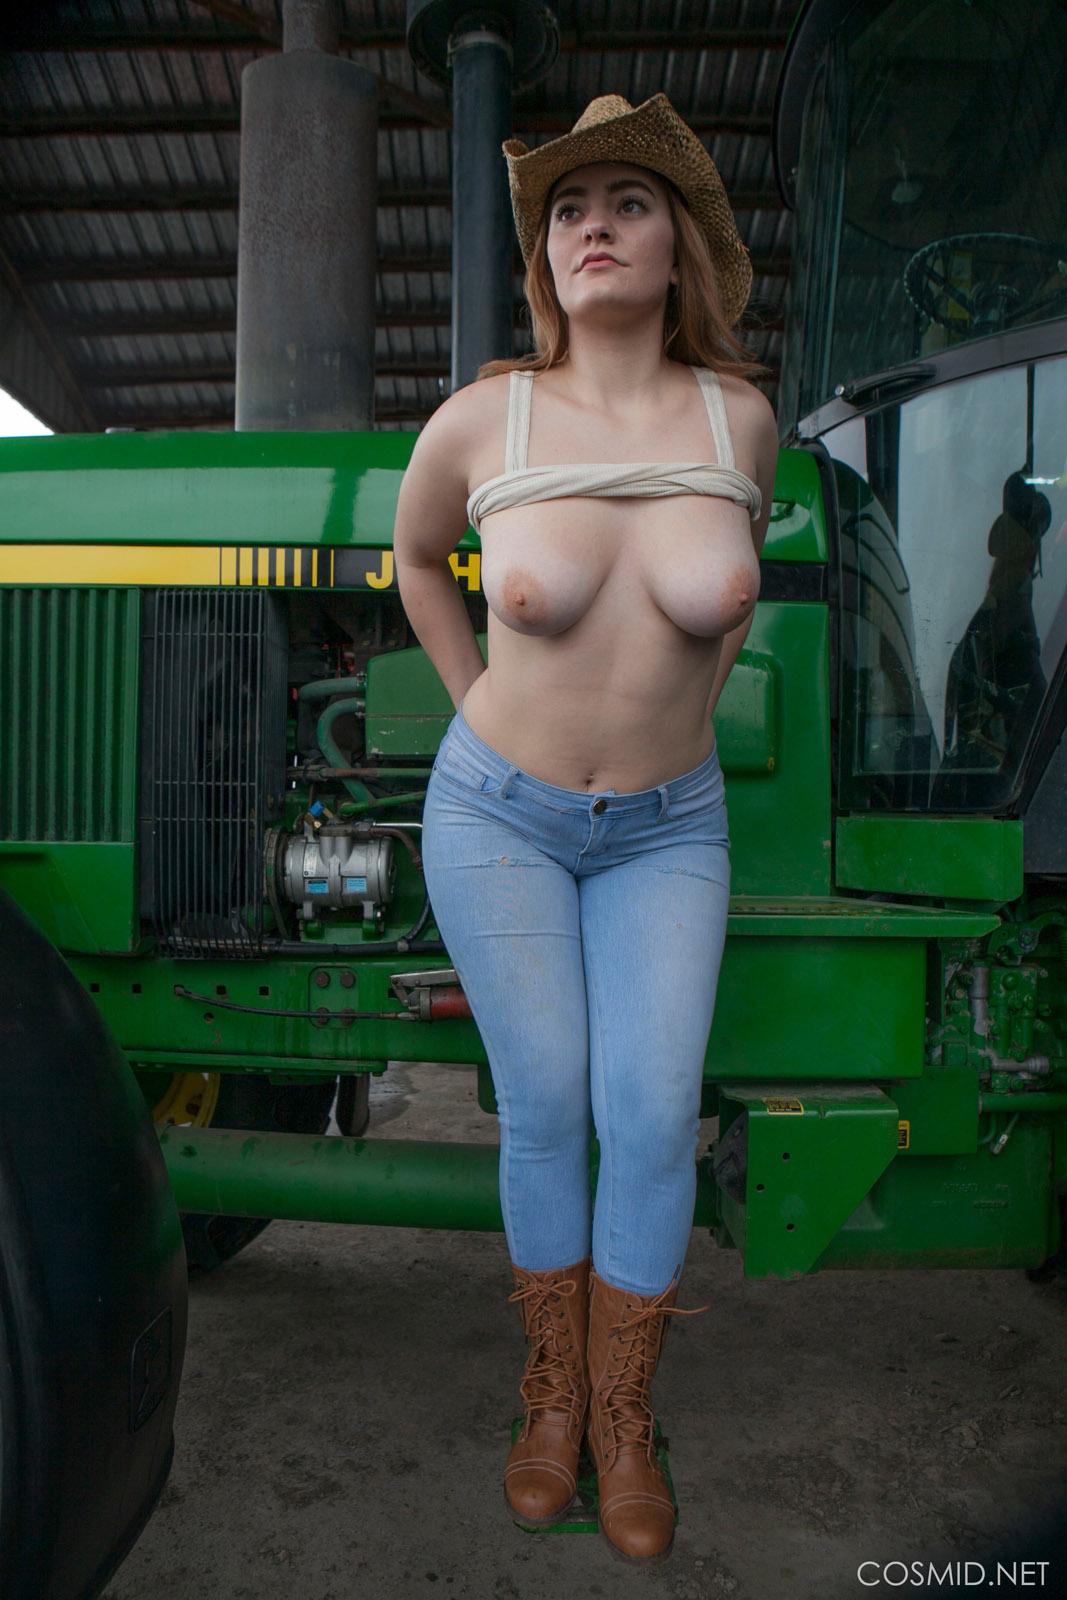 dallin thorn tractor girl cosmid